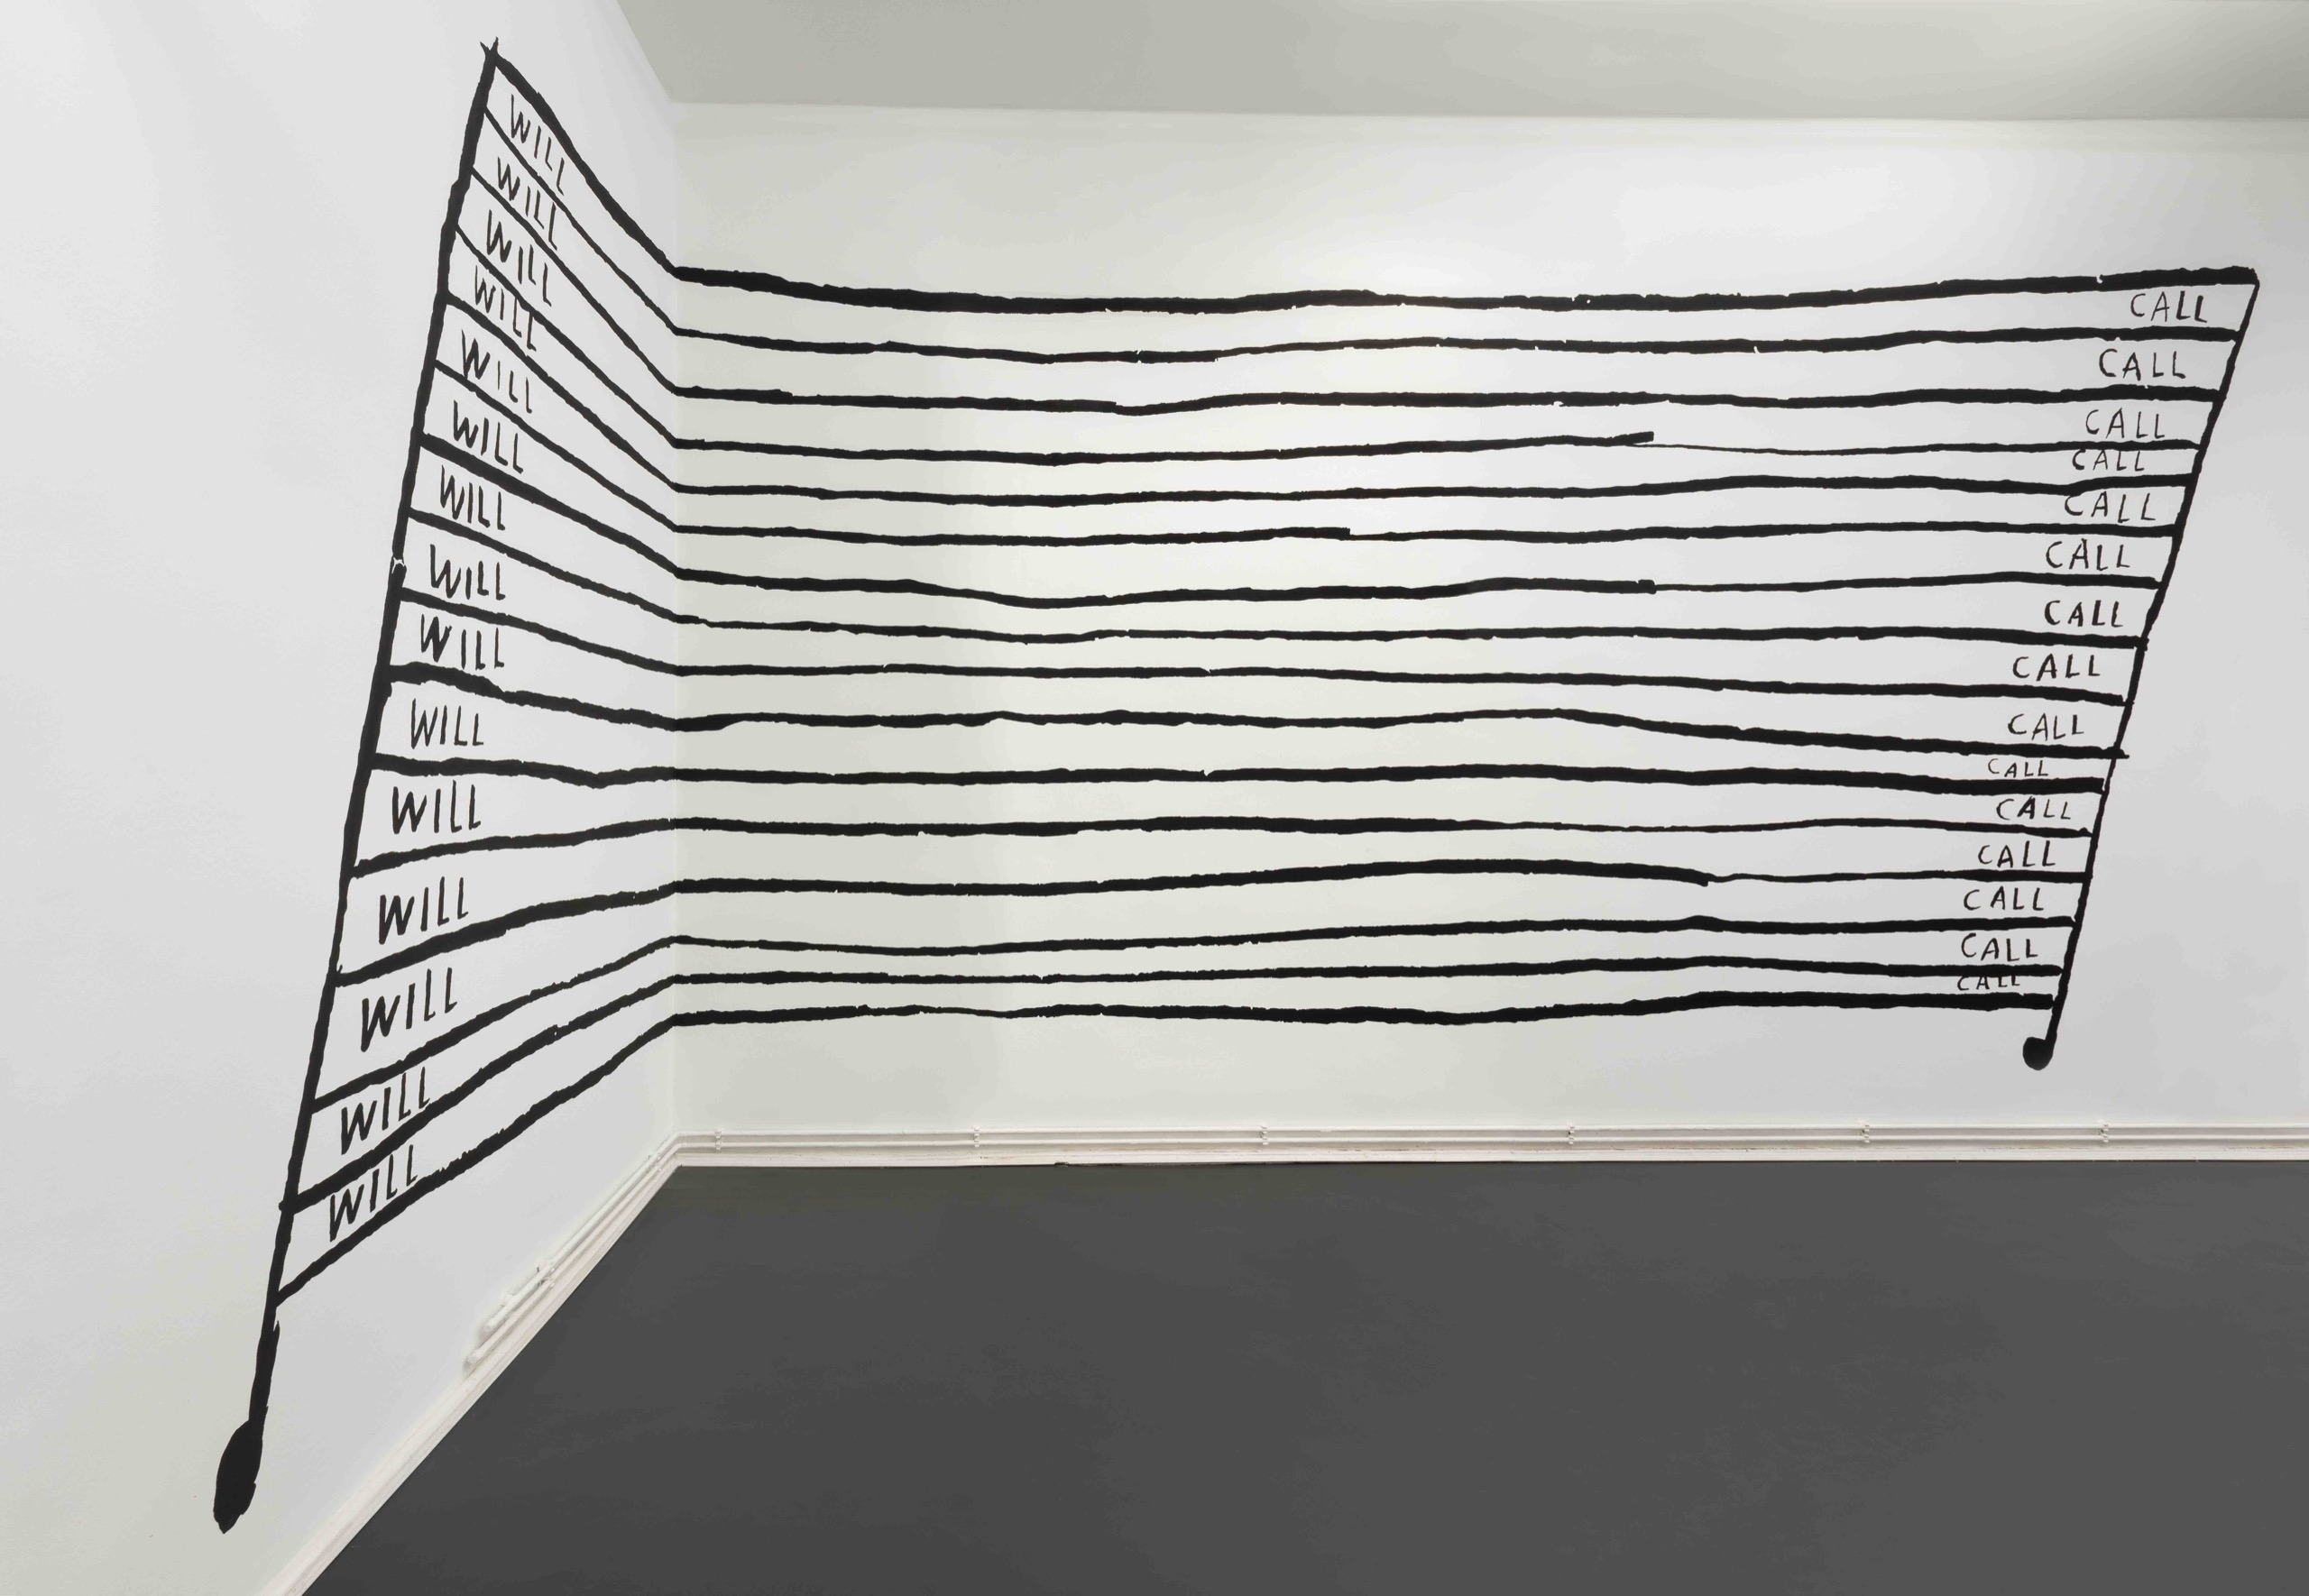 Christine Sun Kim, Will … Call, 2021 wall painting